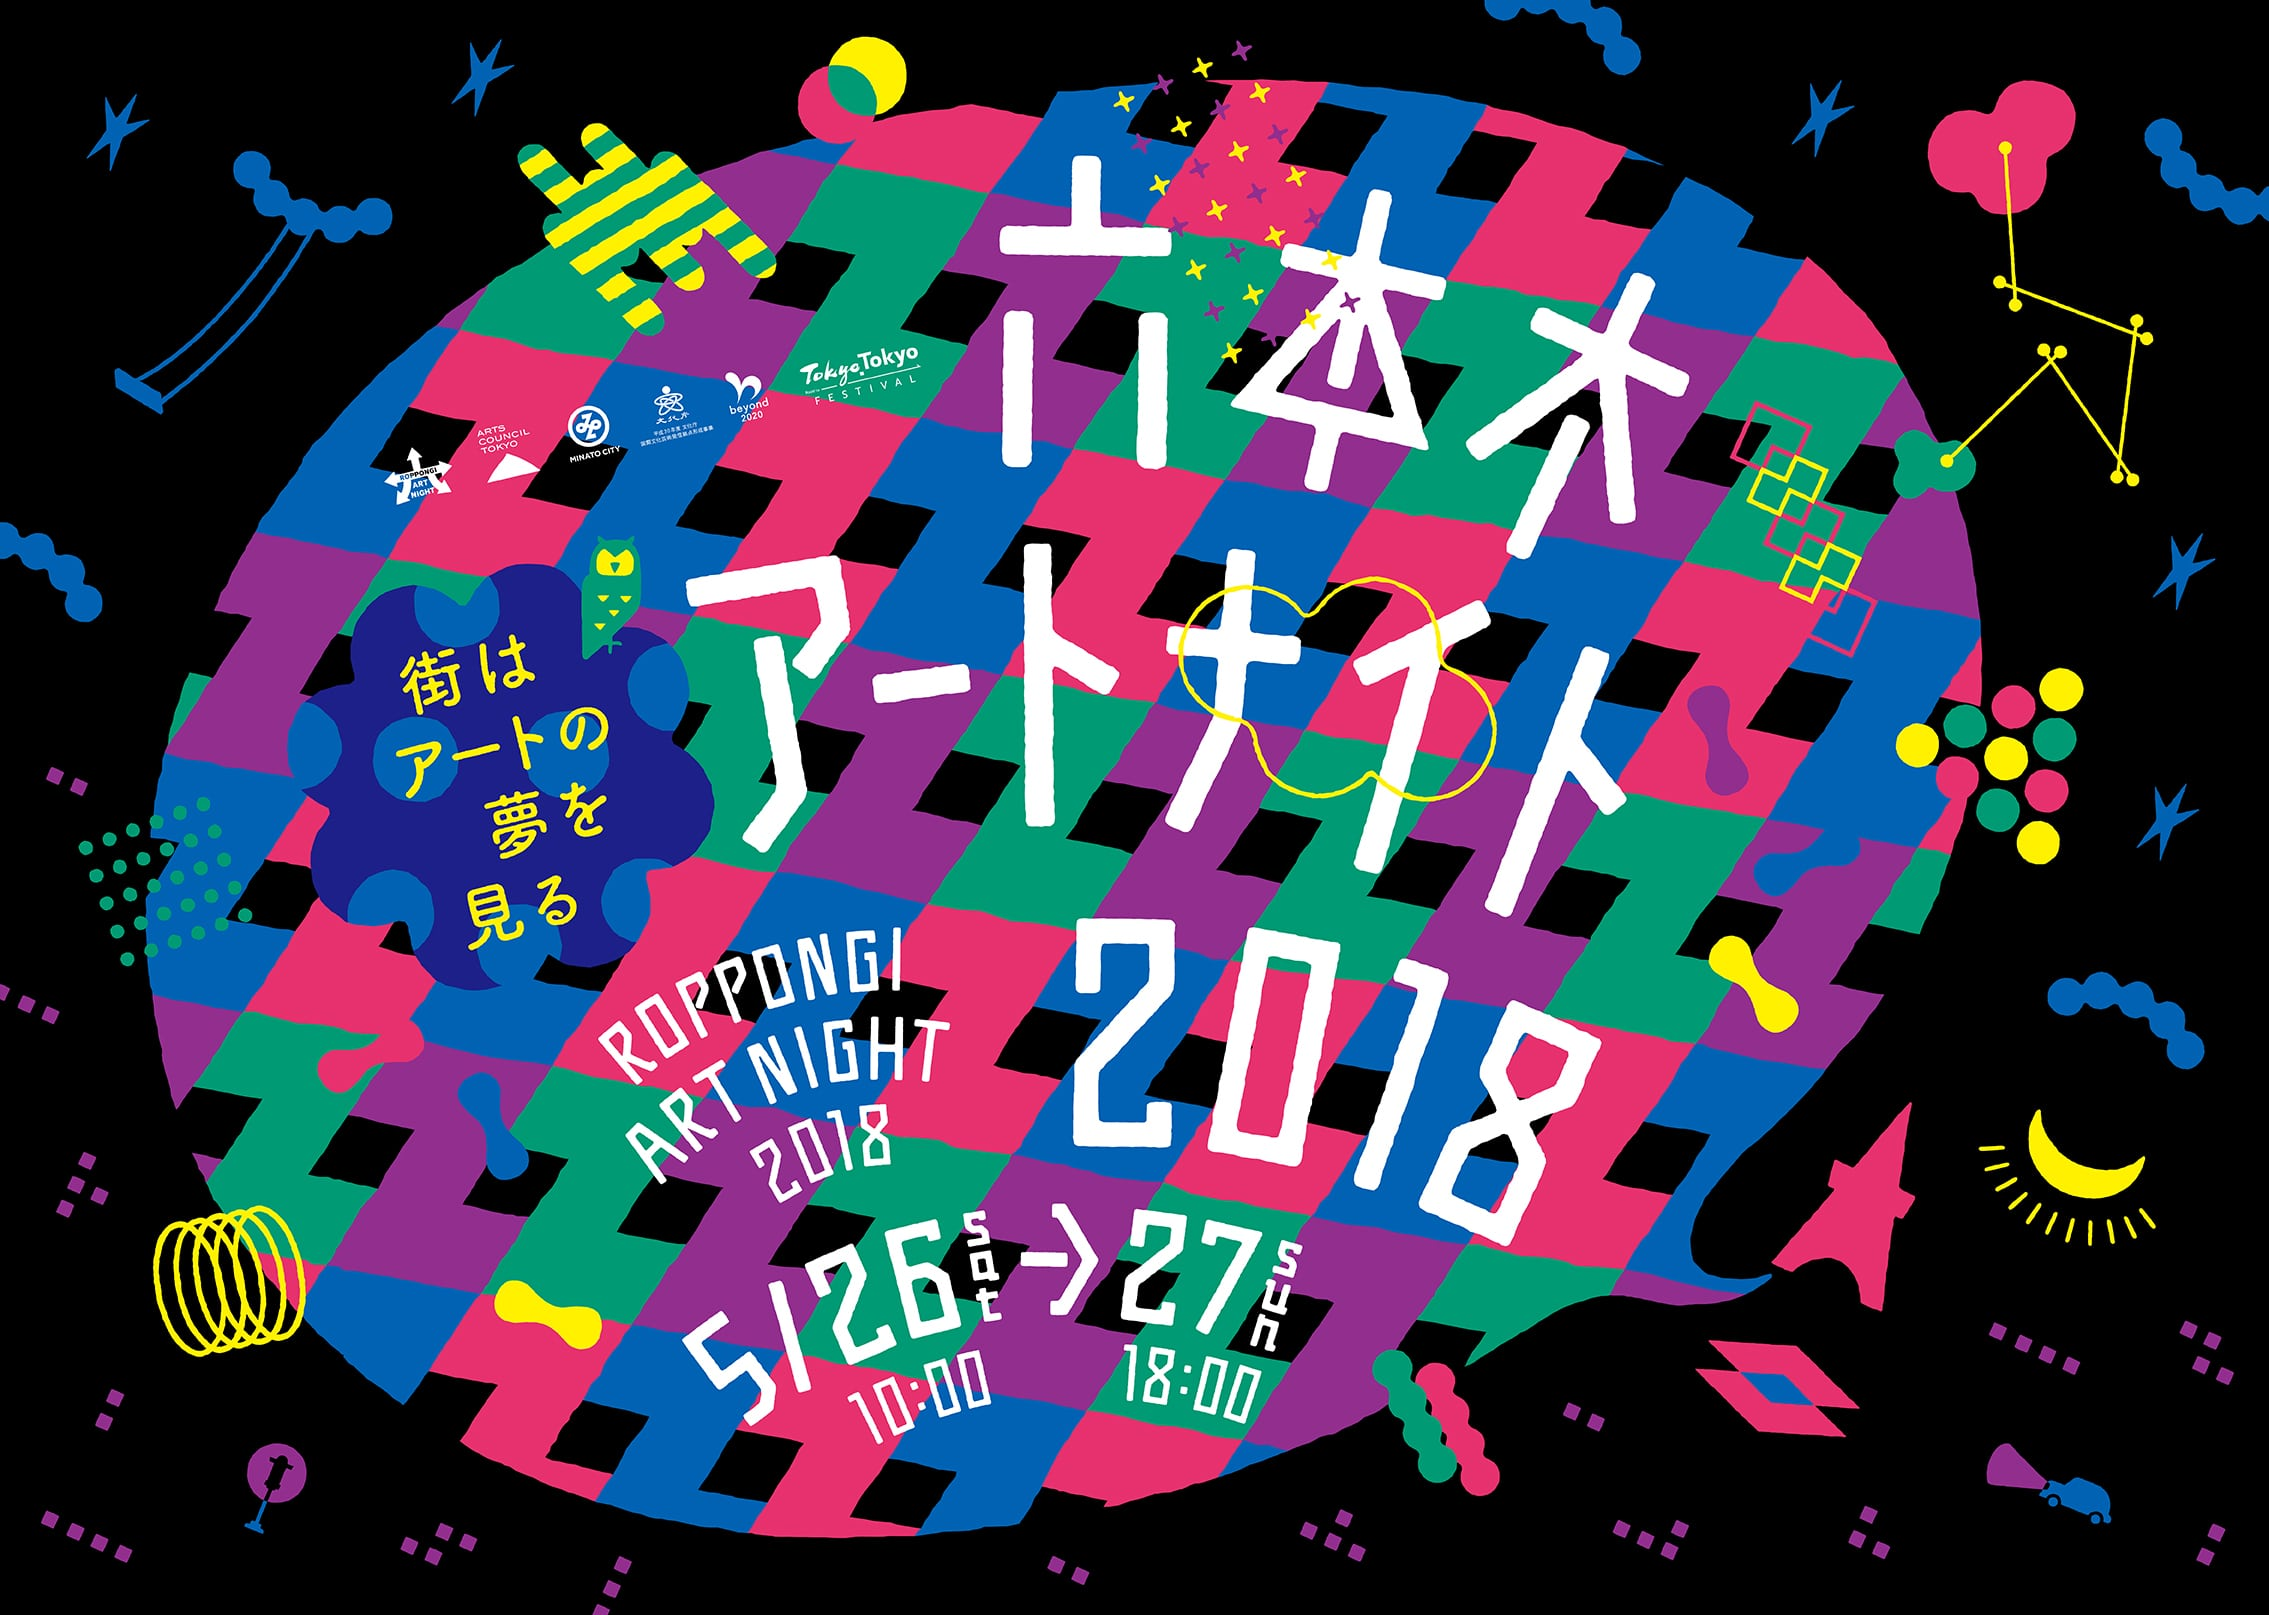 theme 六本木アートナイト2018